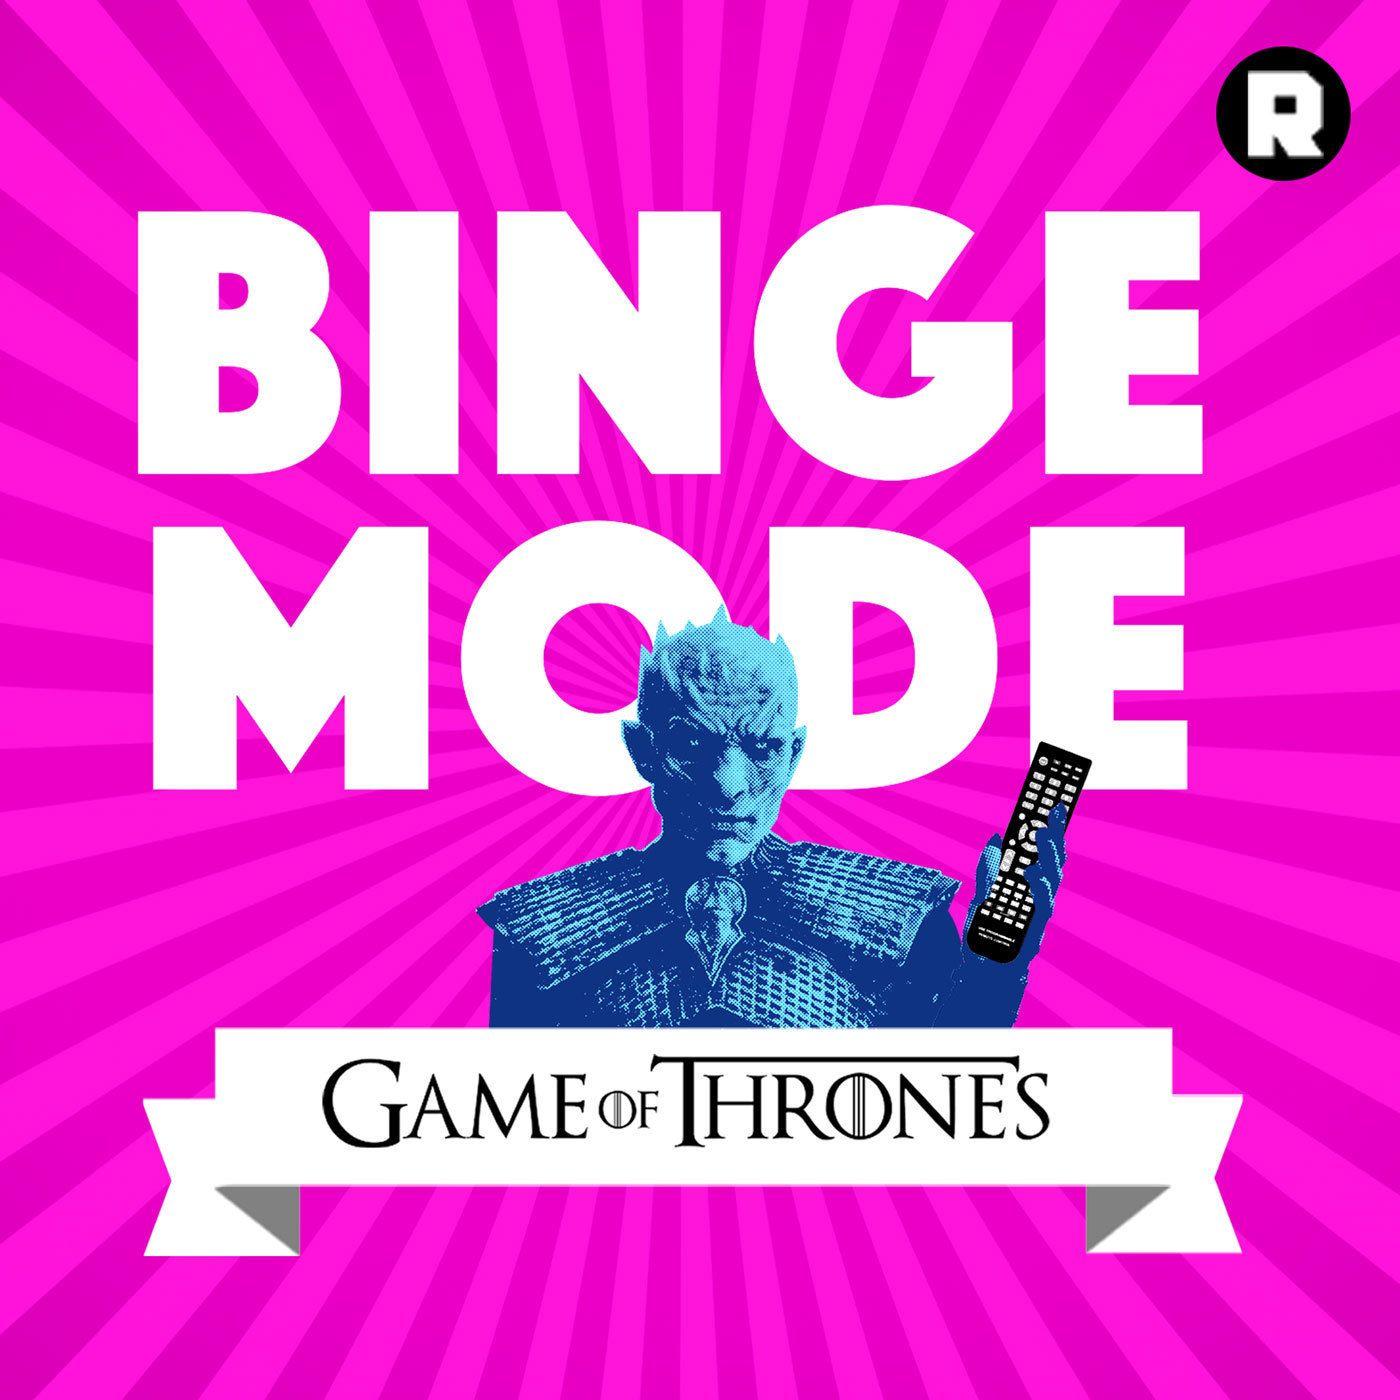 Binge Mode: Game of Thrones Trailer